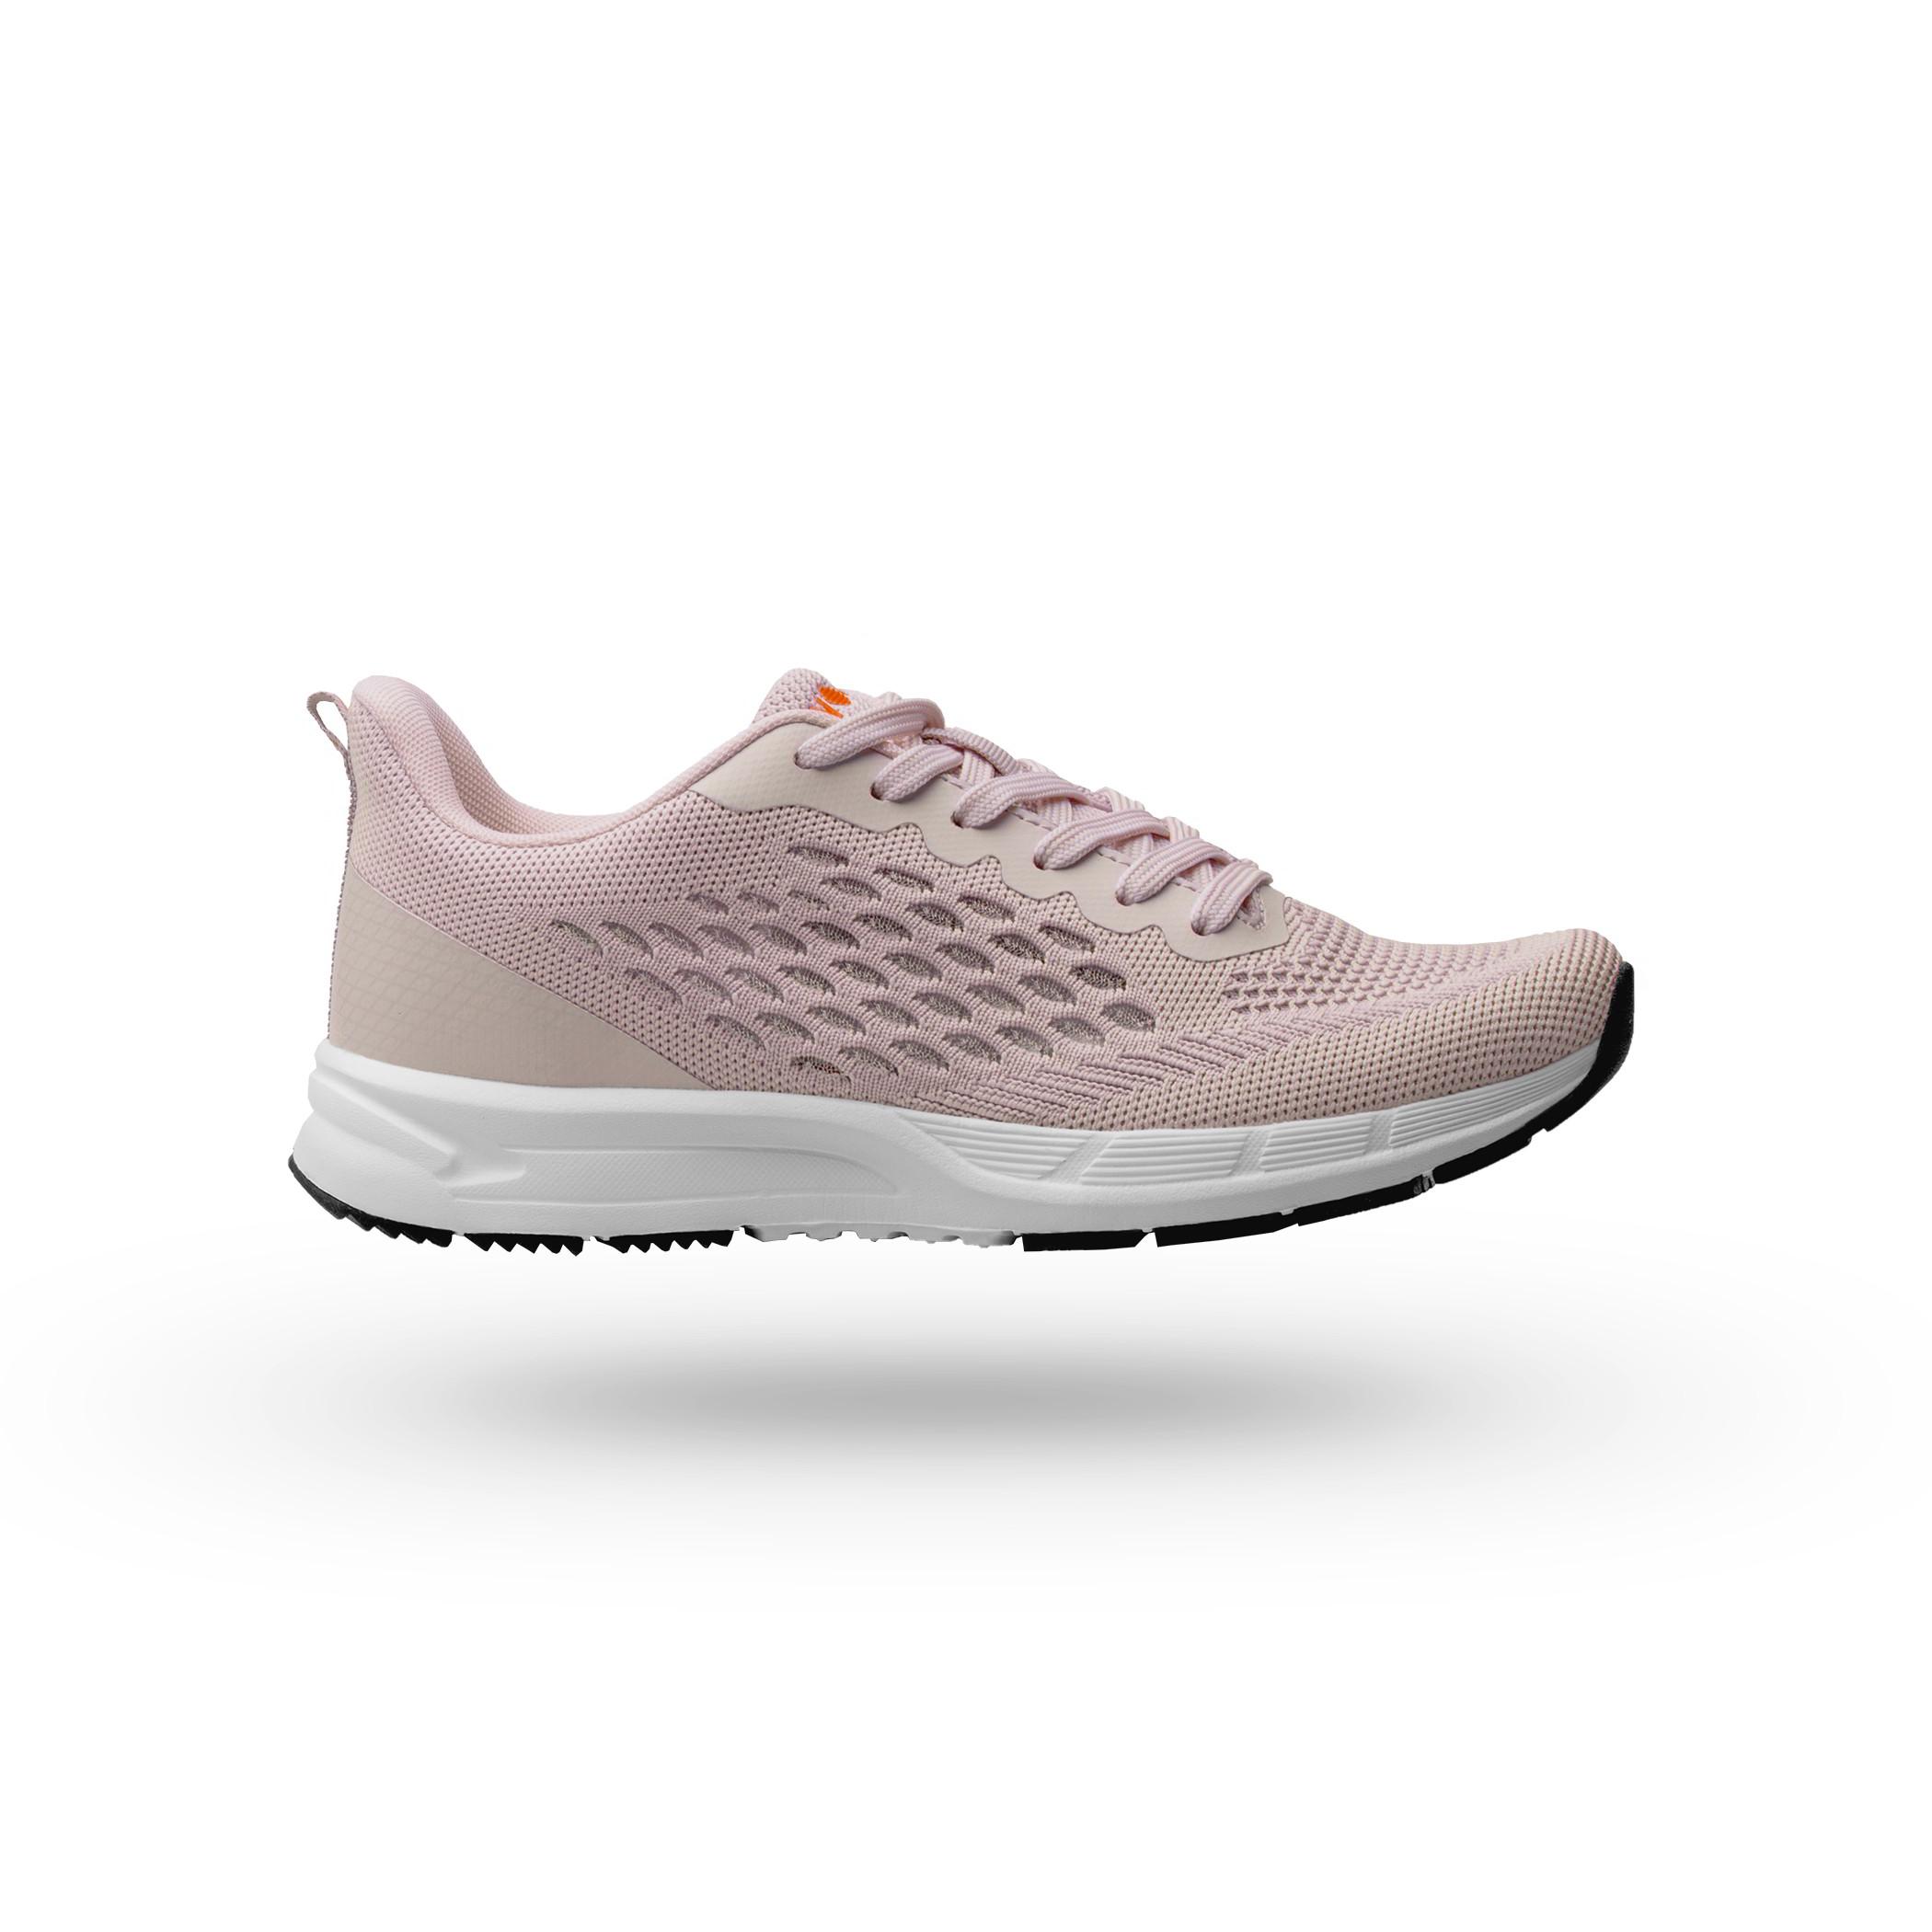 wock-breelite-munka-cipo-pink-2021-01